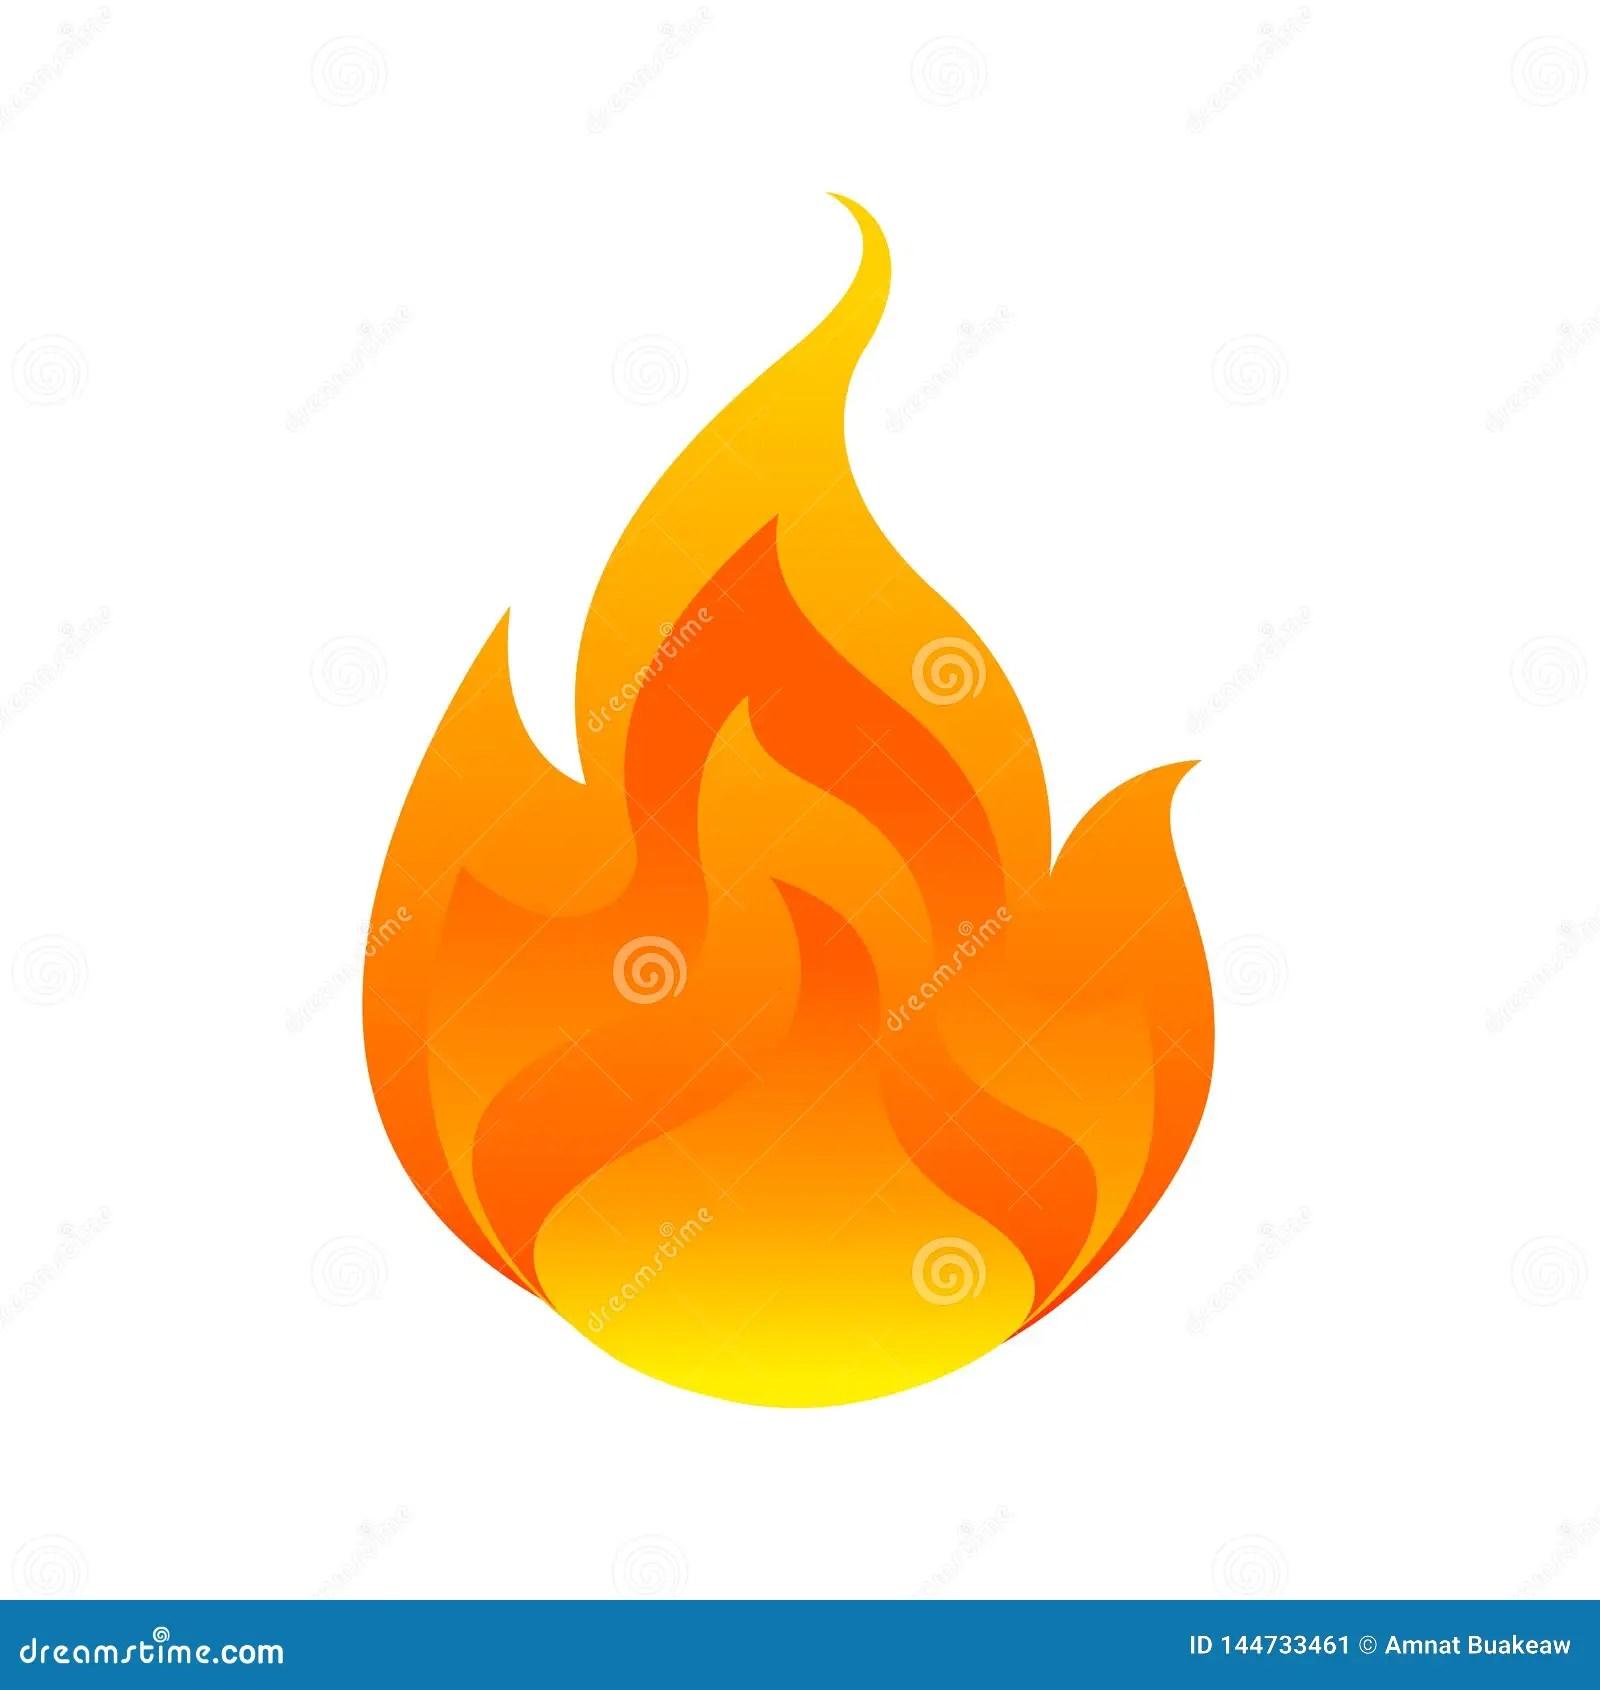 flame fireball isolated on